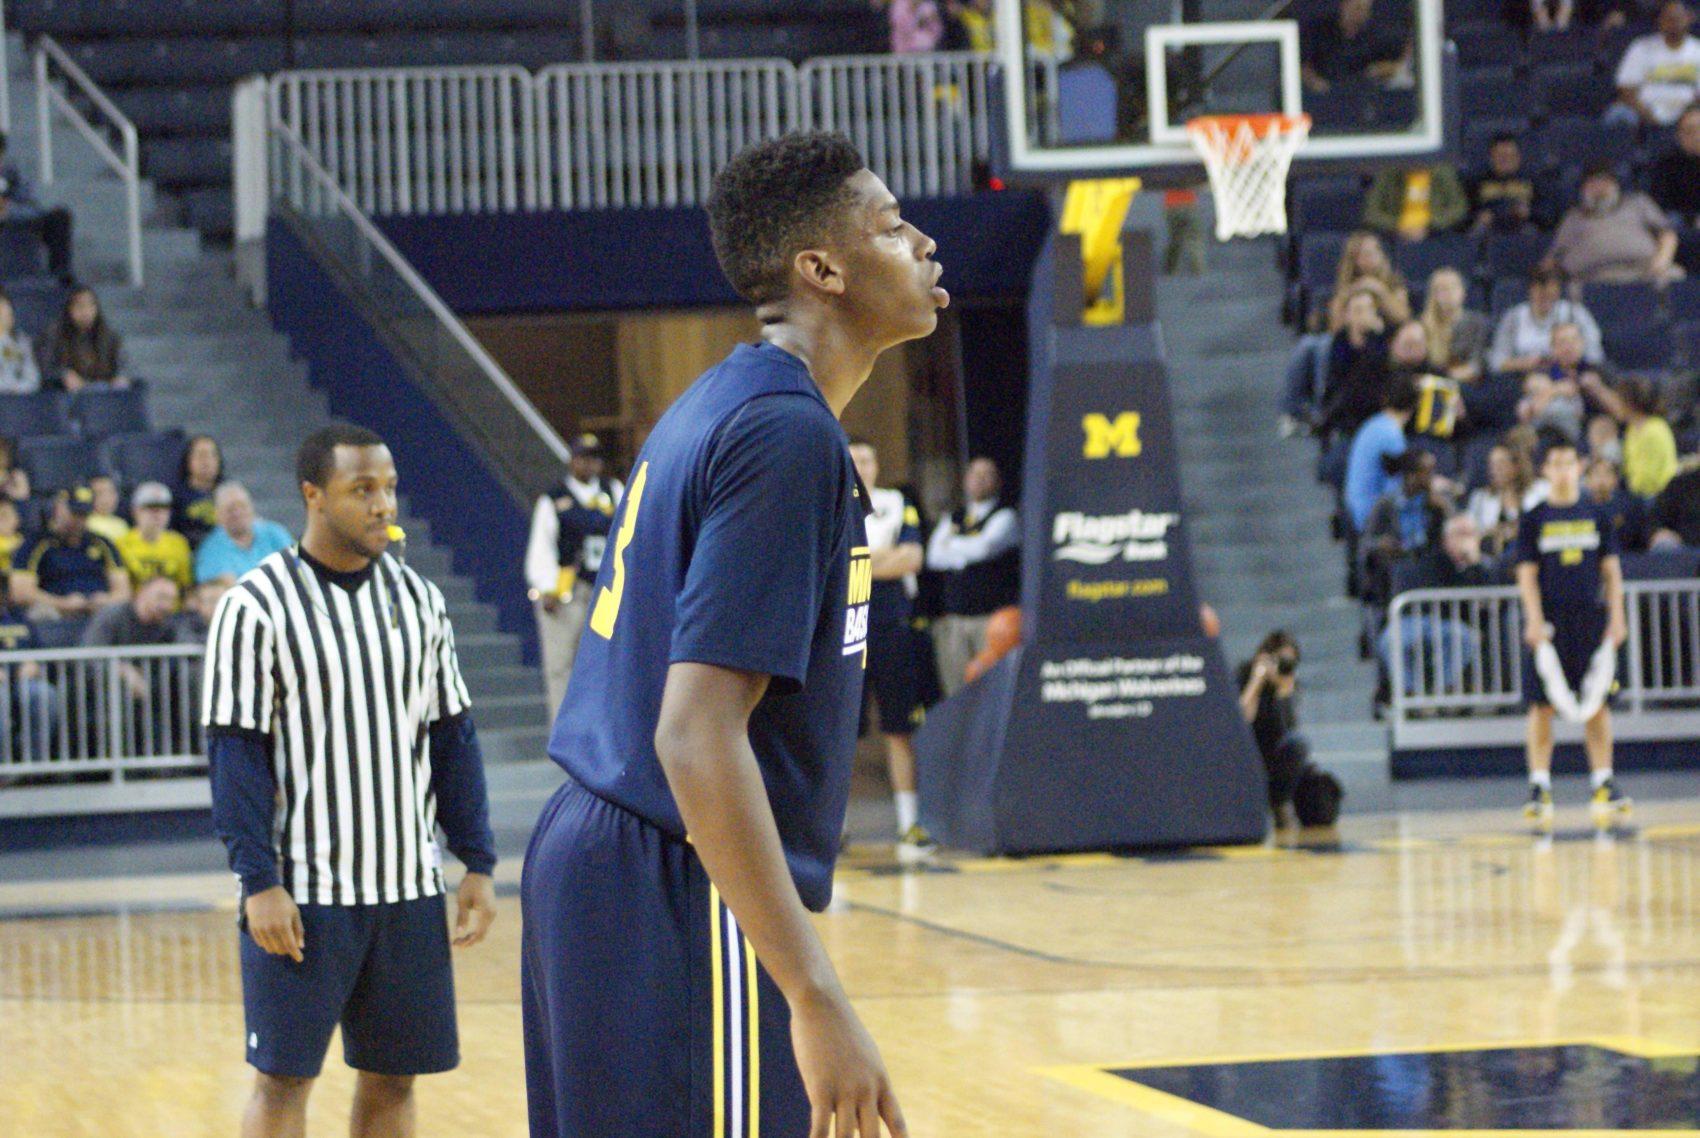 Michigan Basketball Open Practice – #7